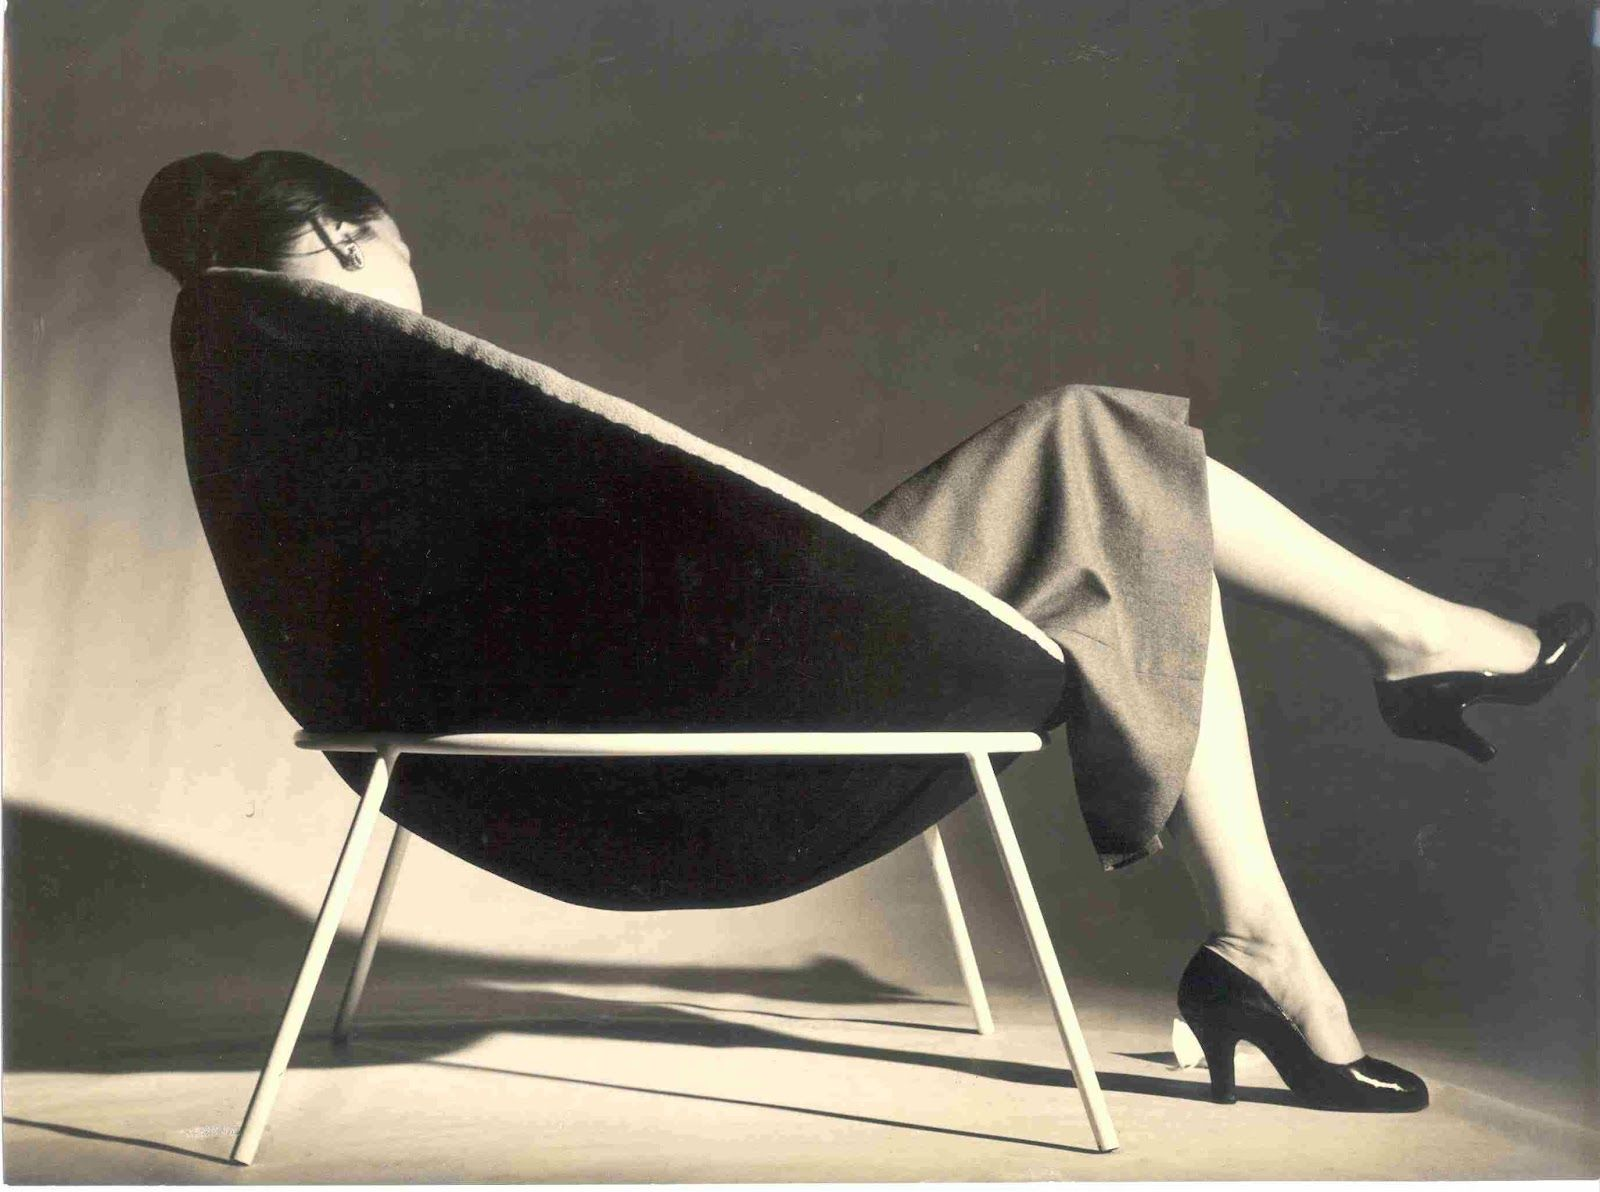 Barber chair sp 508s barber chair ar 182 barber furniture - Lina Bo Bardi Bowl Chair